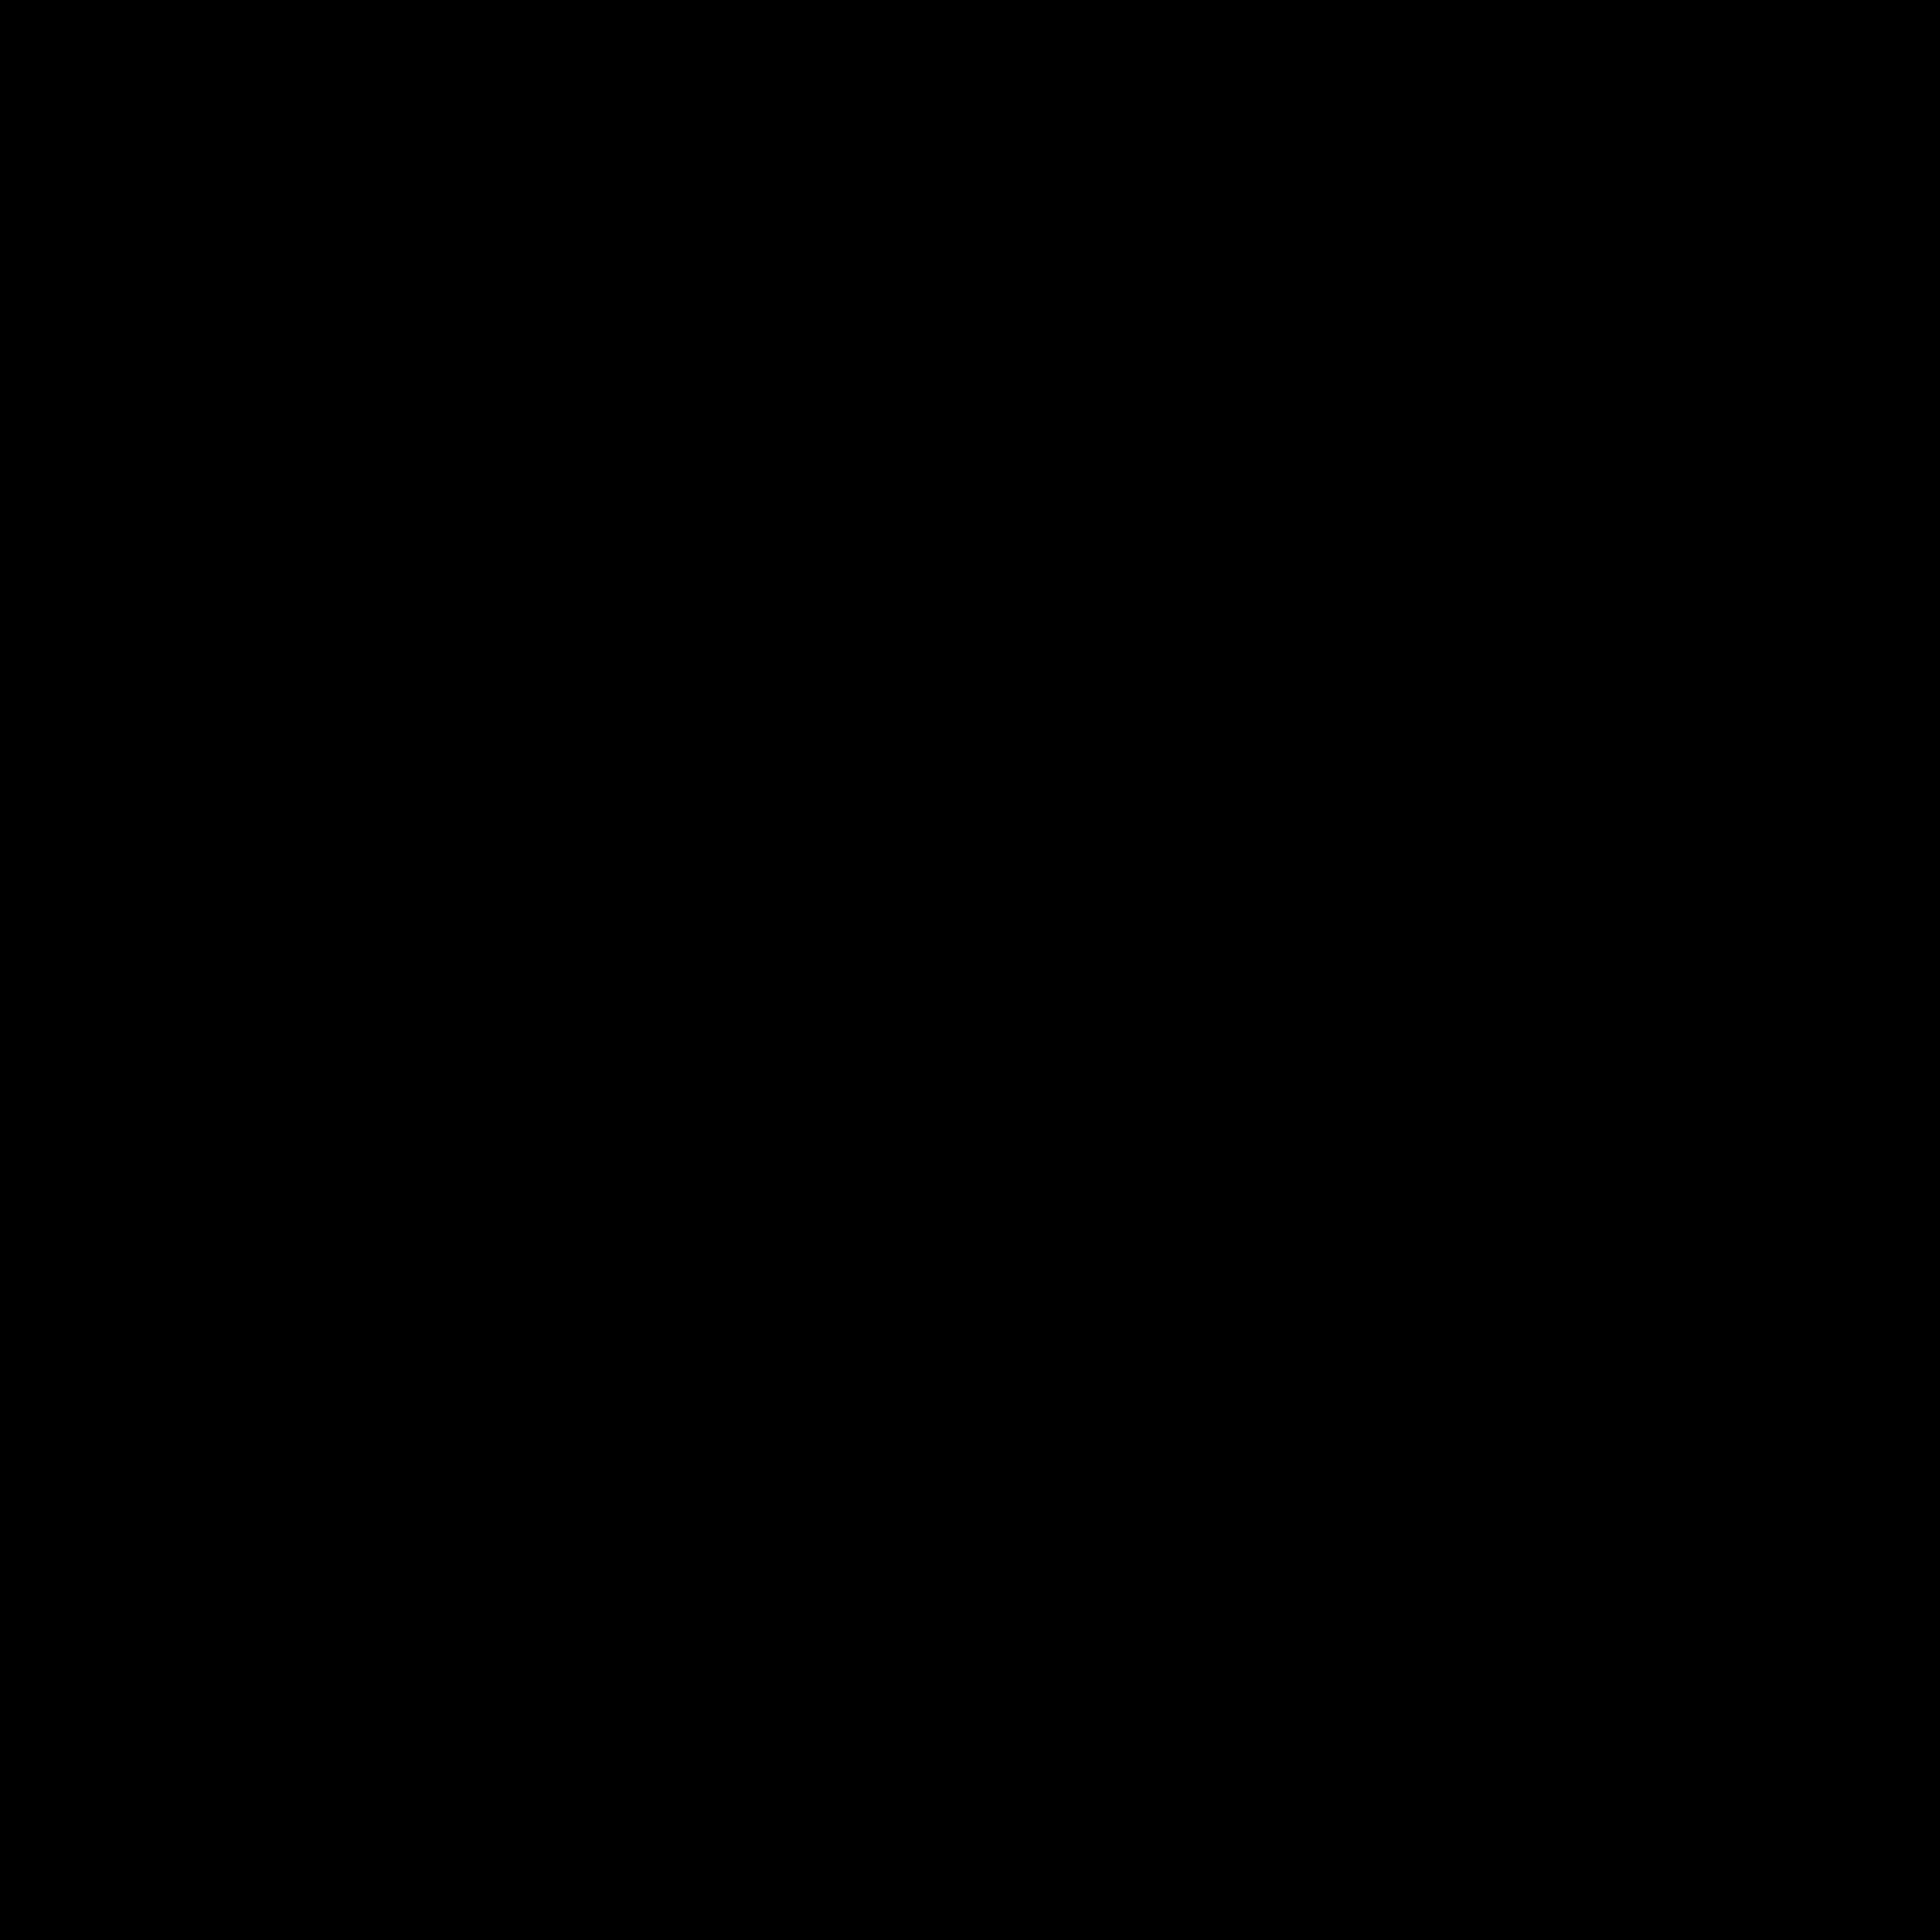 ASA Logo PNG Transparent & SVG Vector.